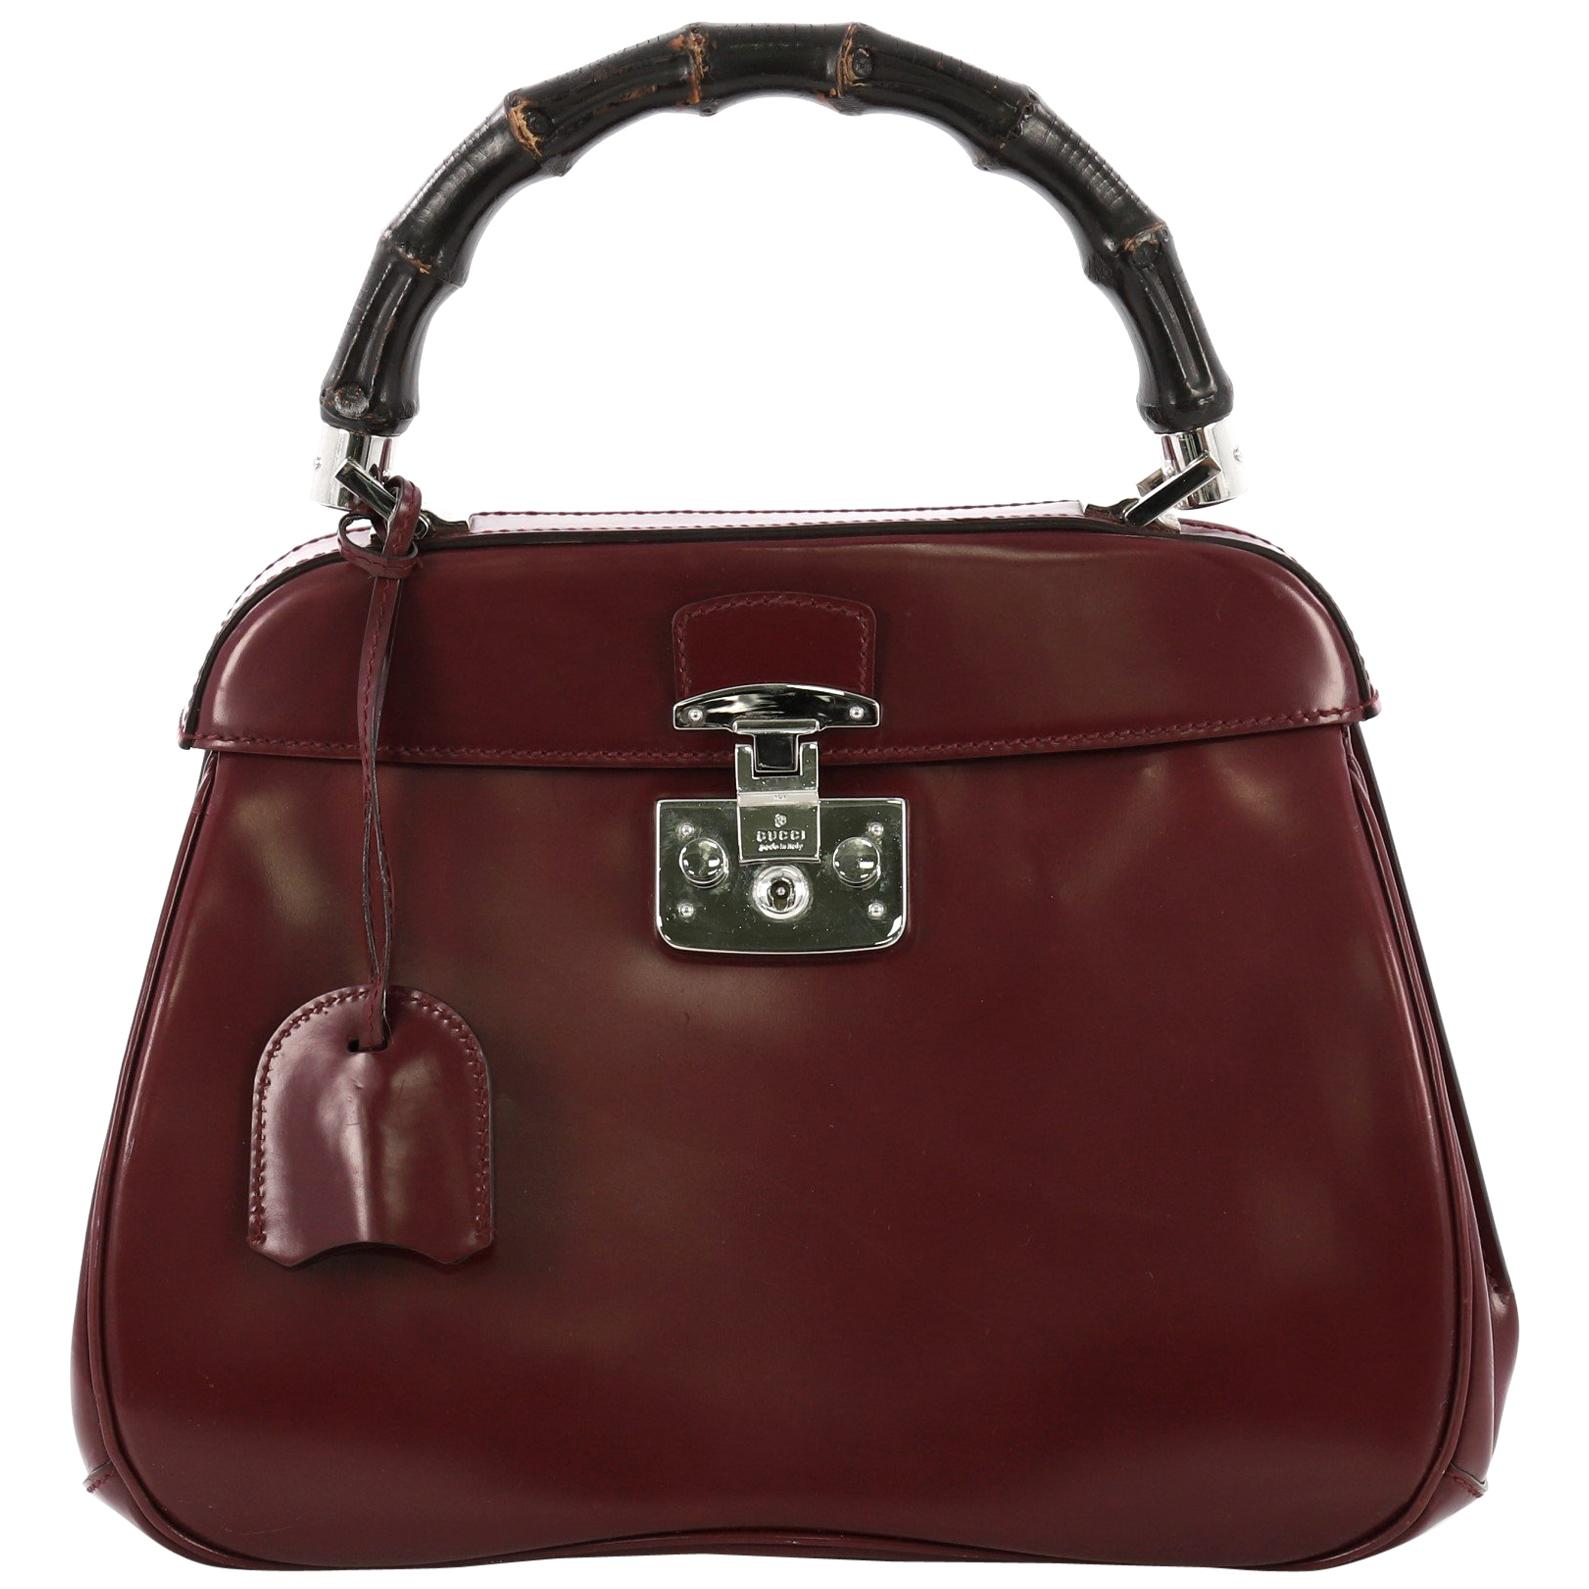 bcbc312e7b0d Purple Leather Handbags - 191 For Sale on 1stdibs